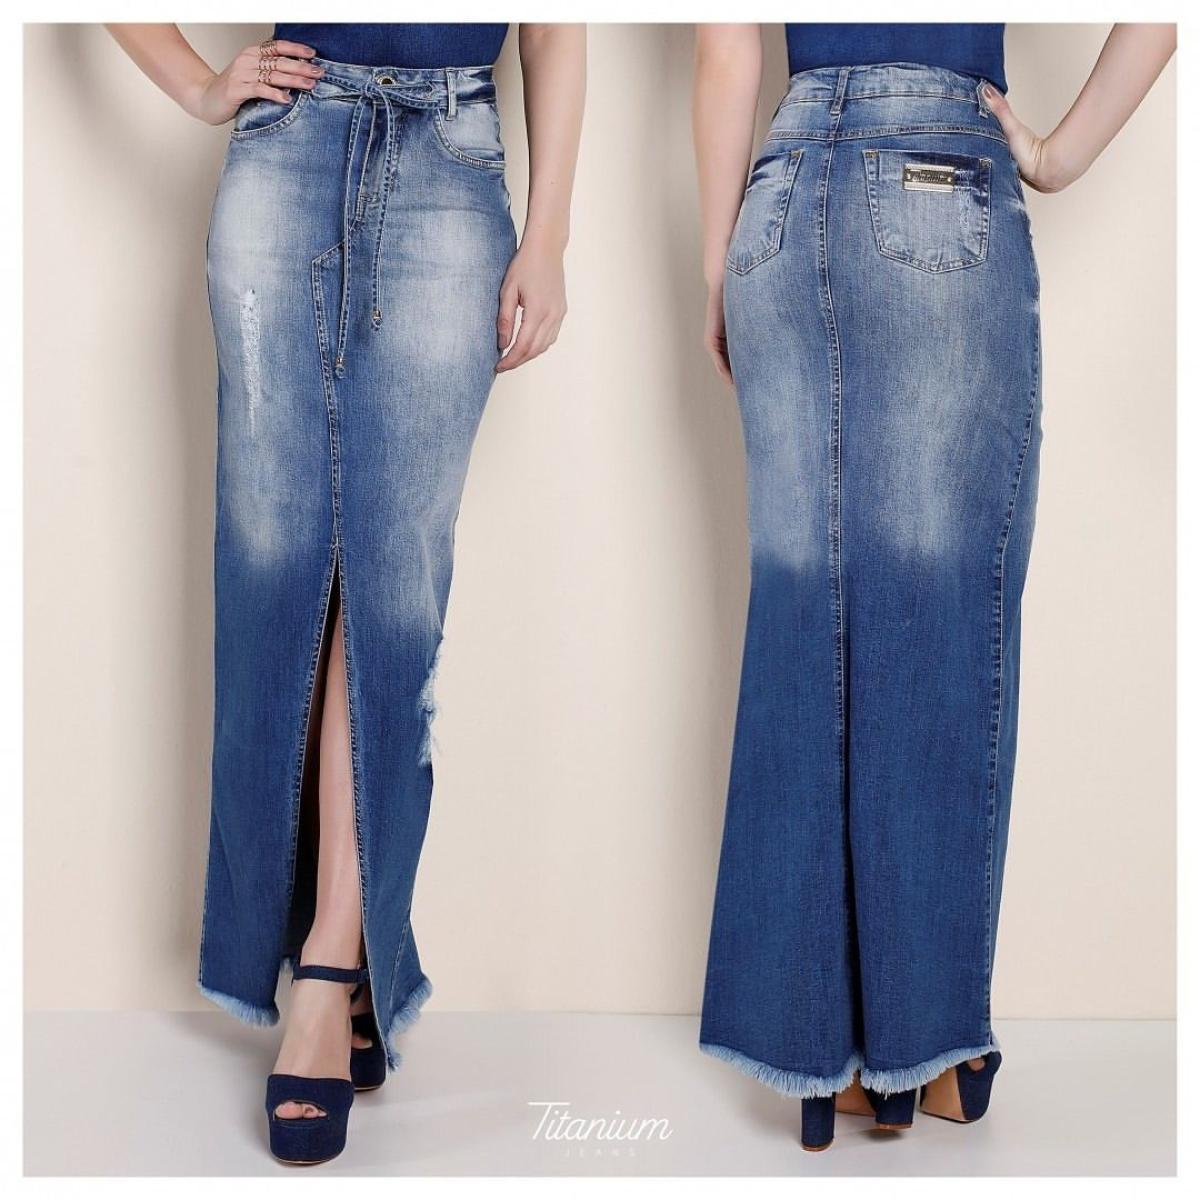 Saia Titanium Longa Jeans Com Fenda Frontal